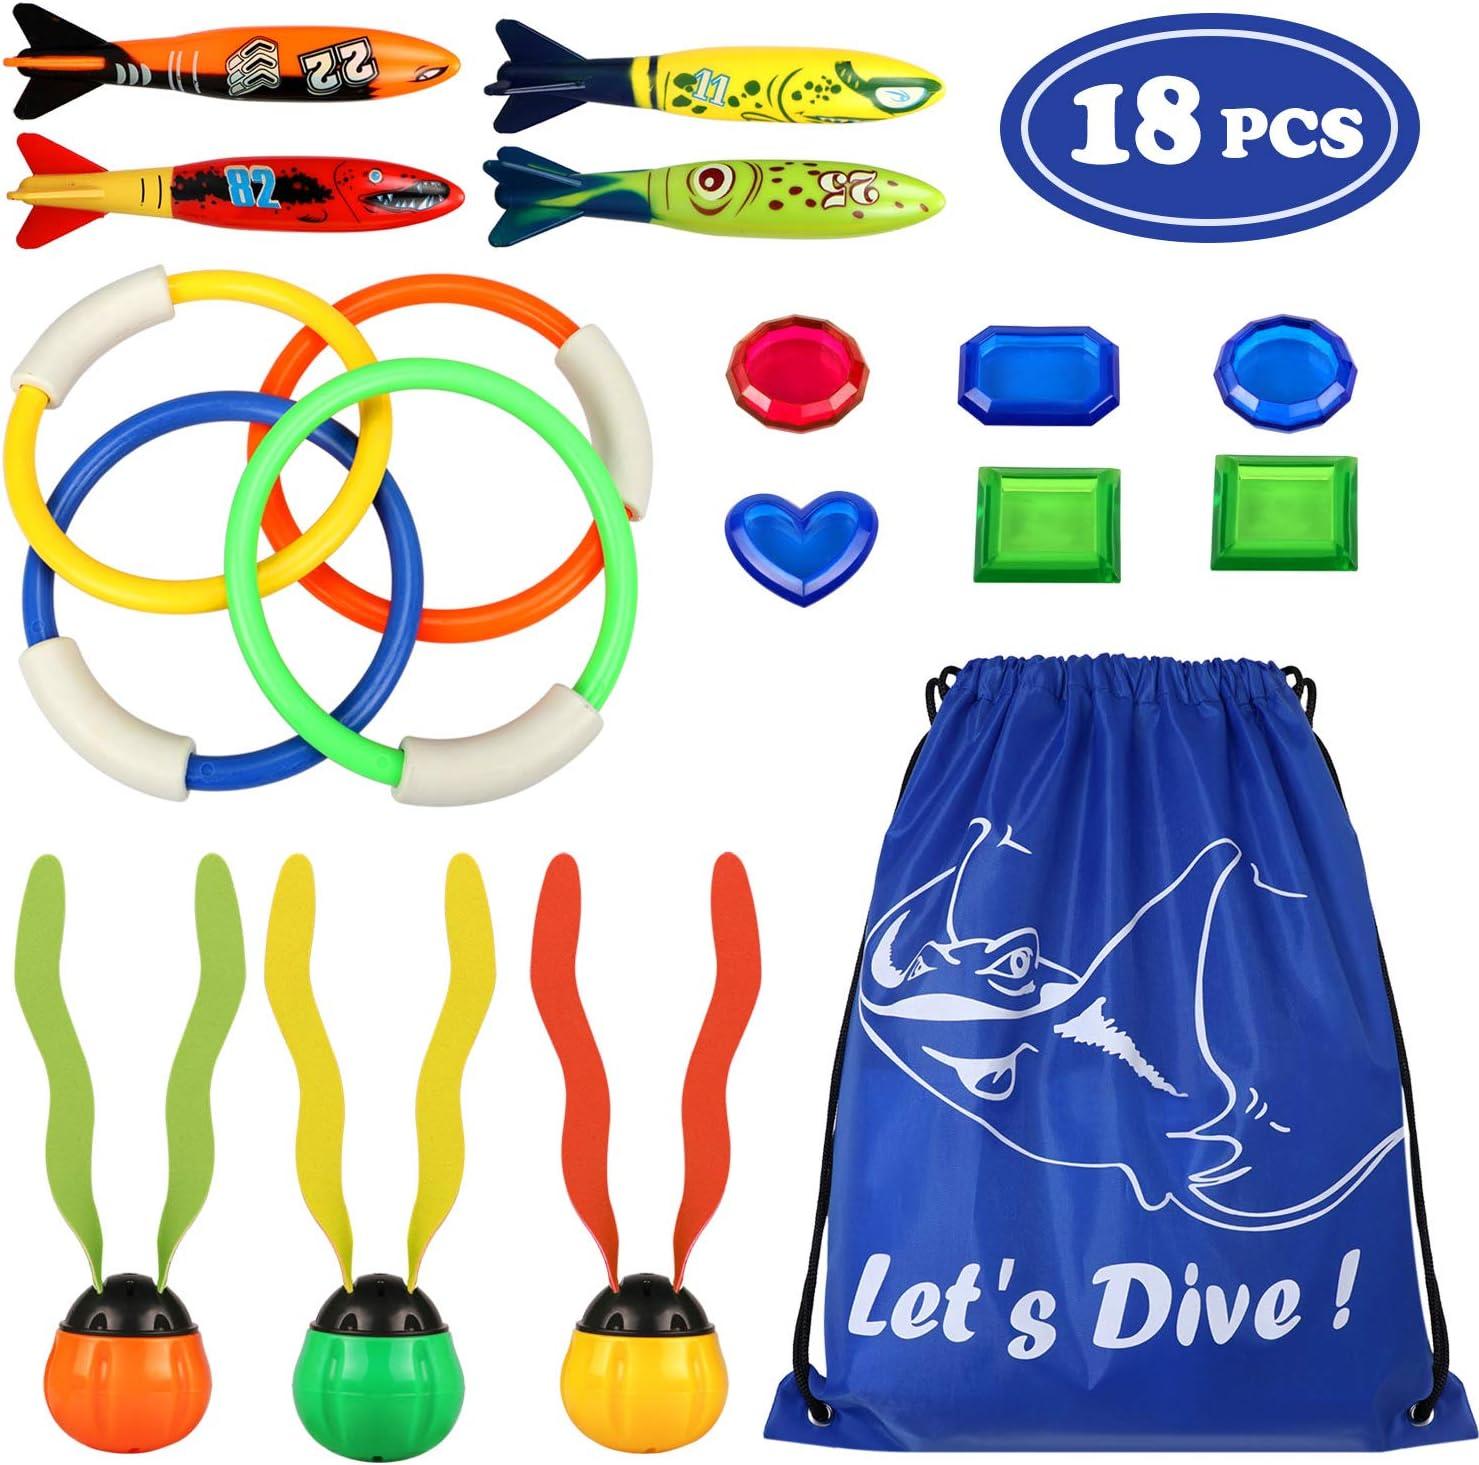 17pcs Juguete de Buceo 4pcs Anillos de buceo 4pcs Torpedos Bandidos 6pcs Diving Gems 3pcs Dive Ball Streamers Juguetes para piscina Natación Subacuática Verano Juegos para niño